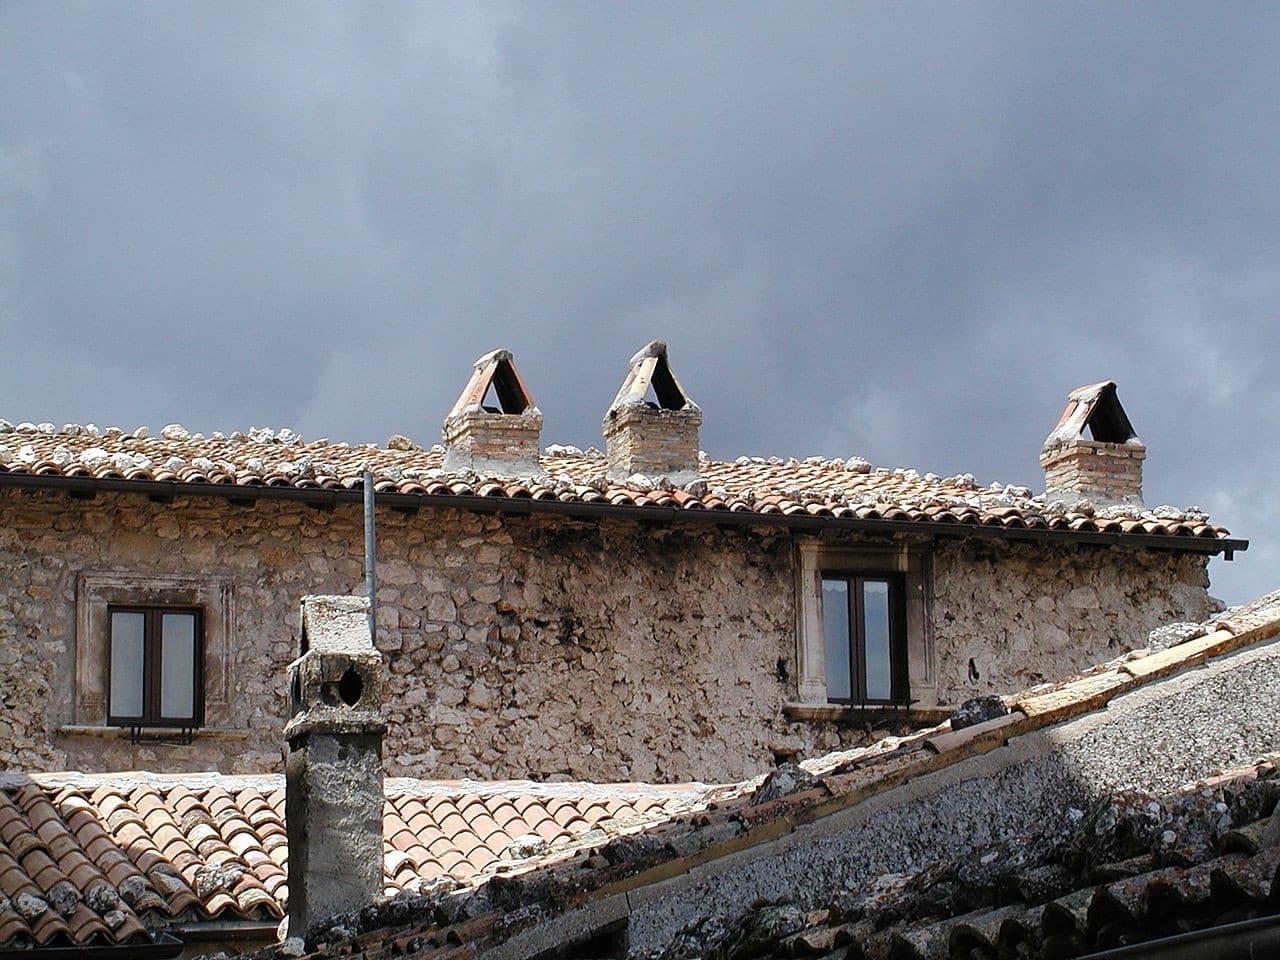 4d461c0201da0435692eb5f46c93c726 - Casas por un euro a cambio de reformarlas